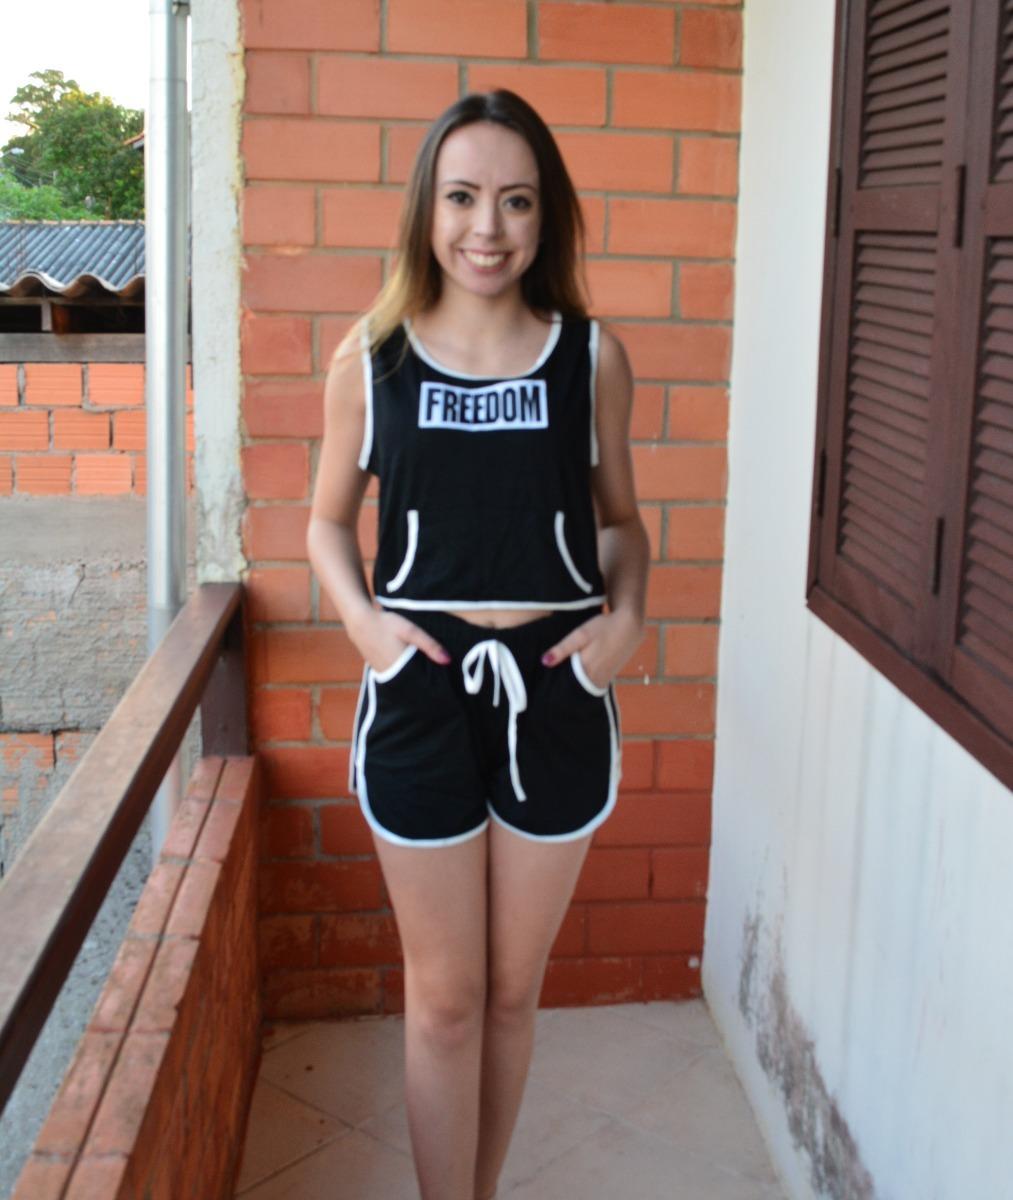 e3bfbcfa43f conjunto fit roupas academia fitness crossfit feminina543. Carregando zoom.